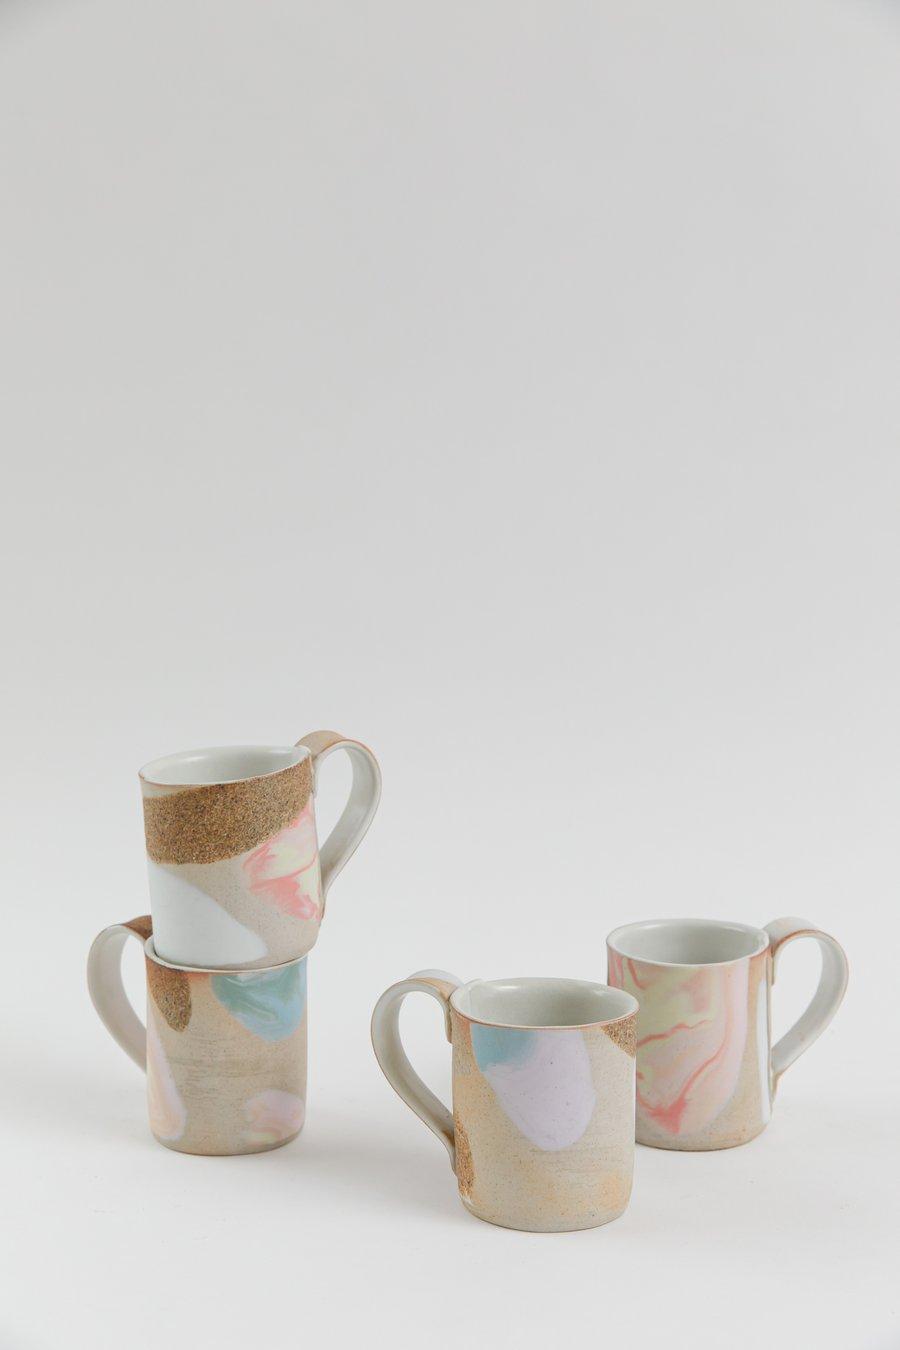 Image of Tangerine Lavender Dream - Porcelain inlay Handled Mug